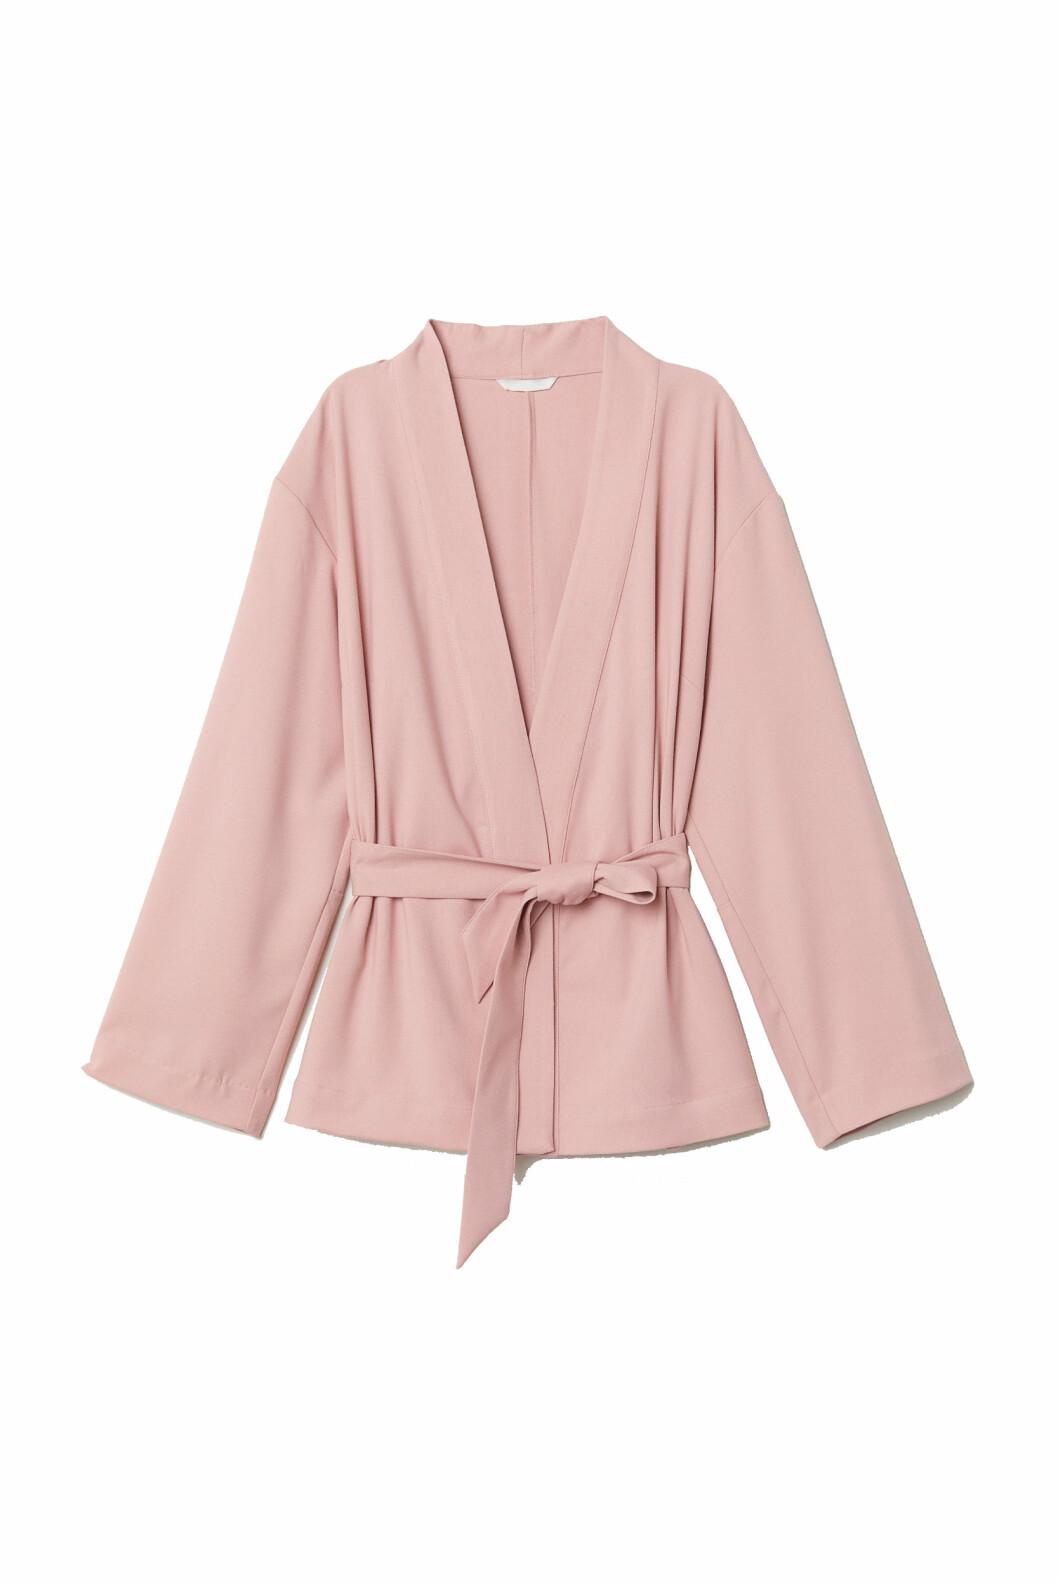 Kimono fra H&M  300,-  https://www2.hm.com/no_no/productpage.0665612003.html